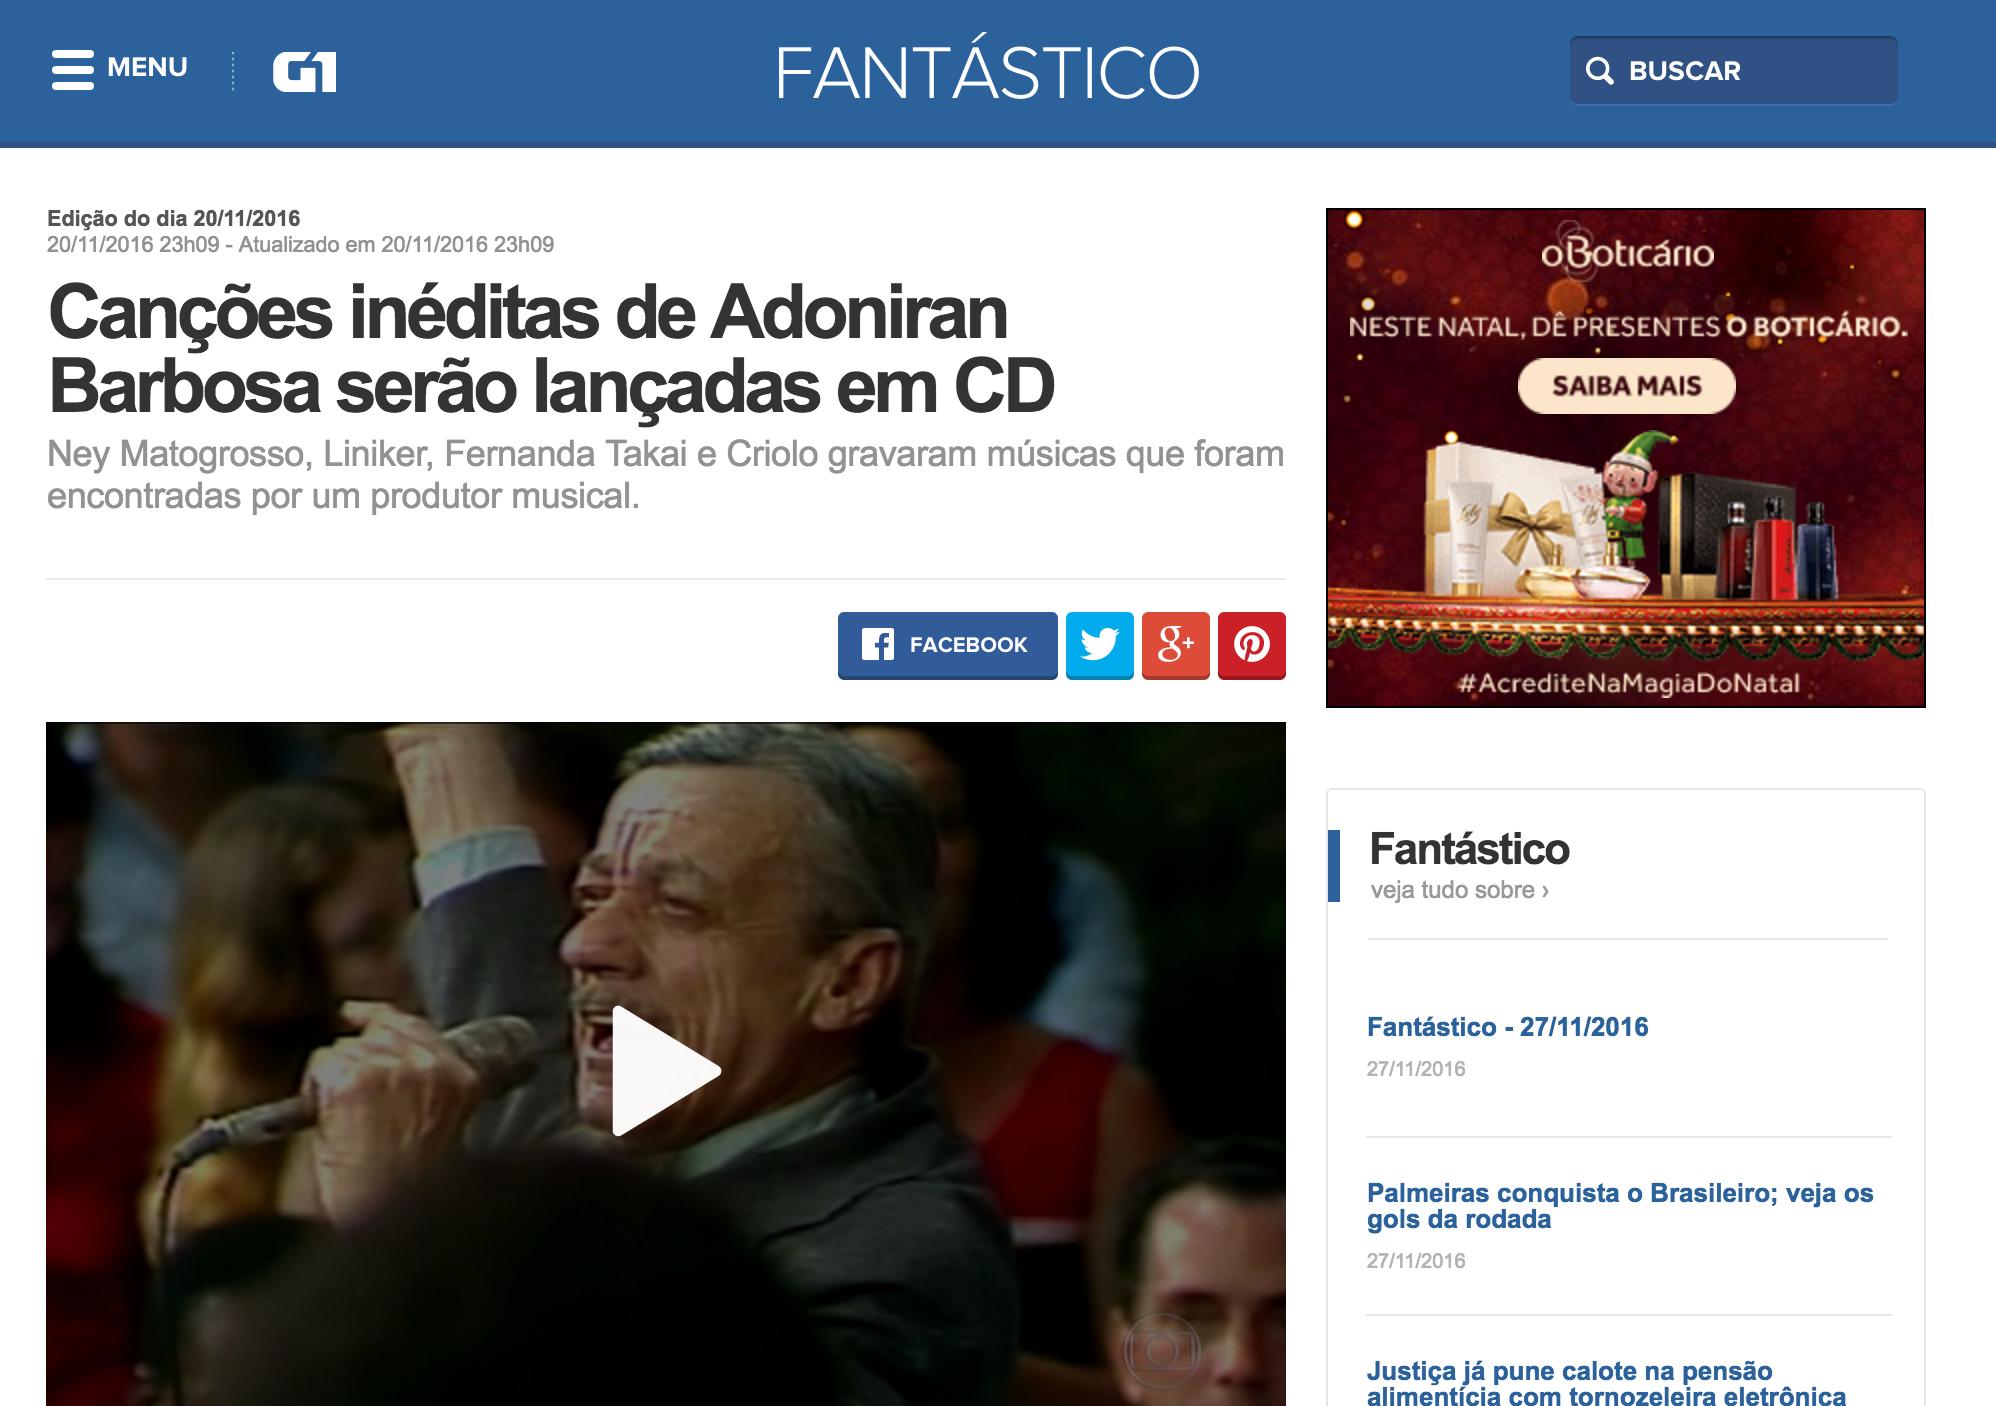 Rede Globo - Fantástico